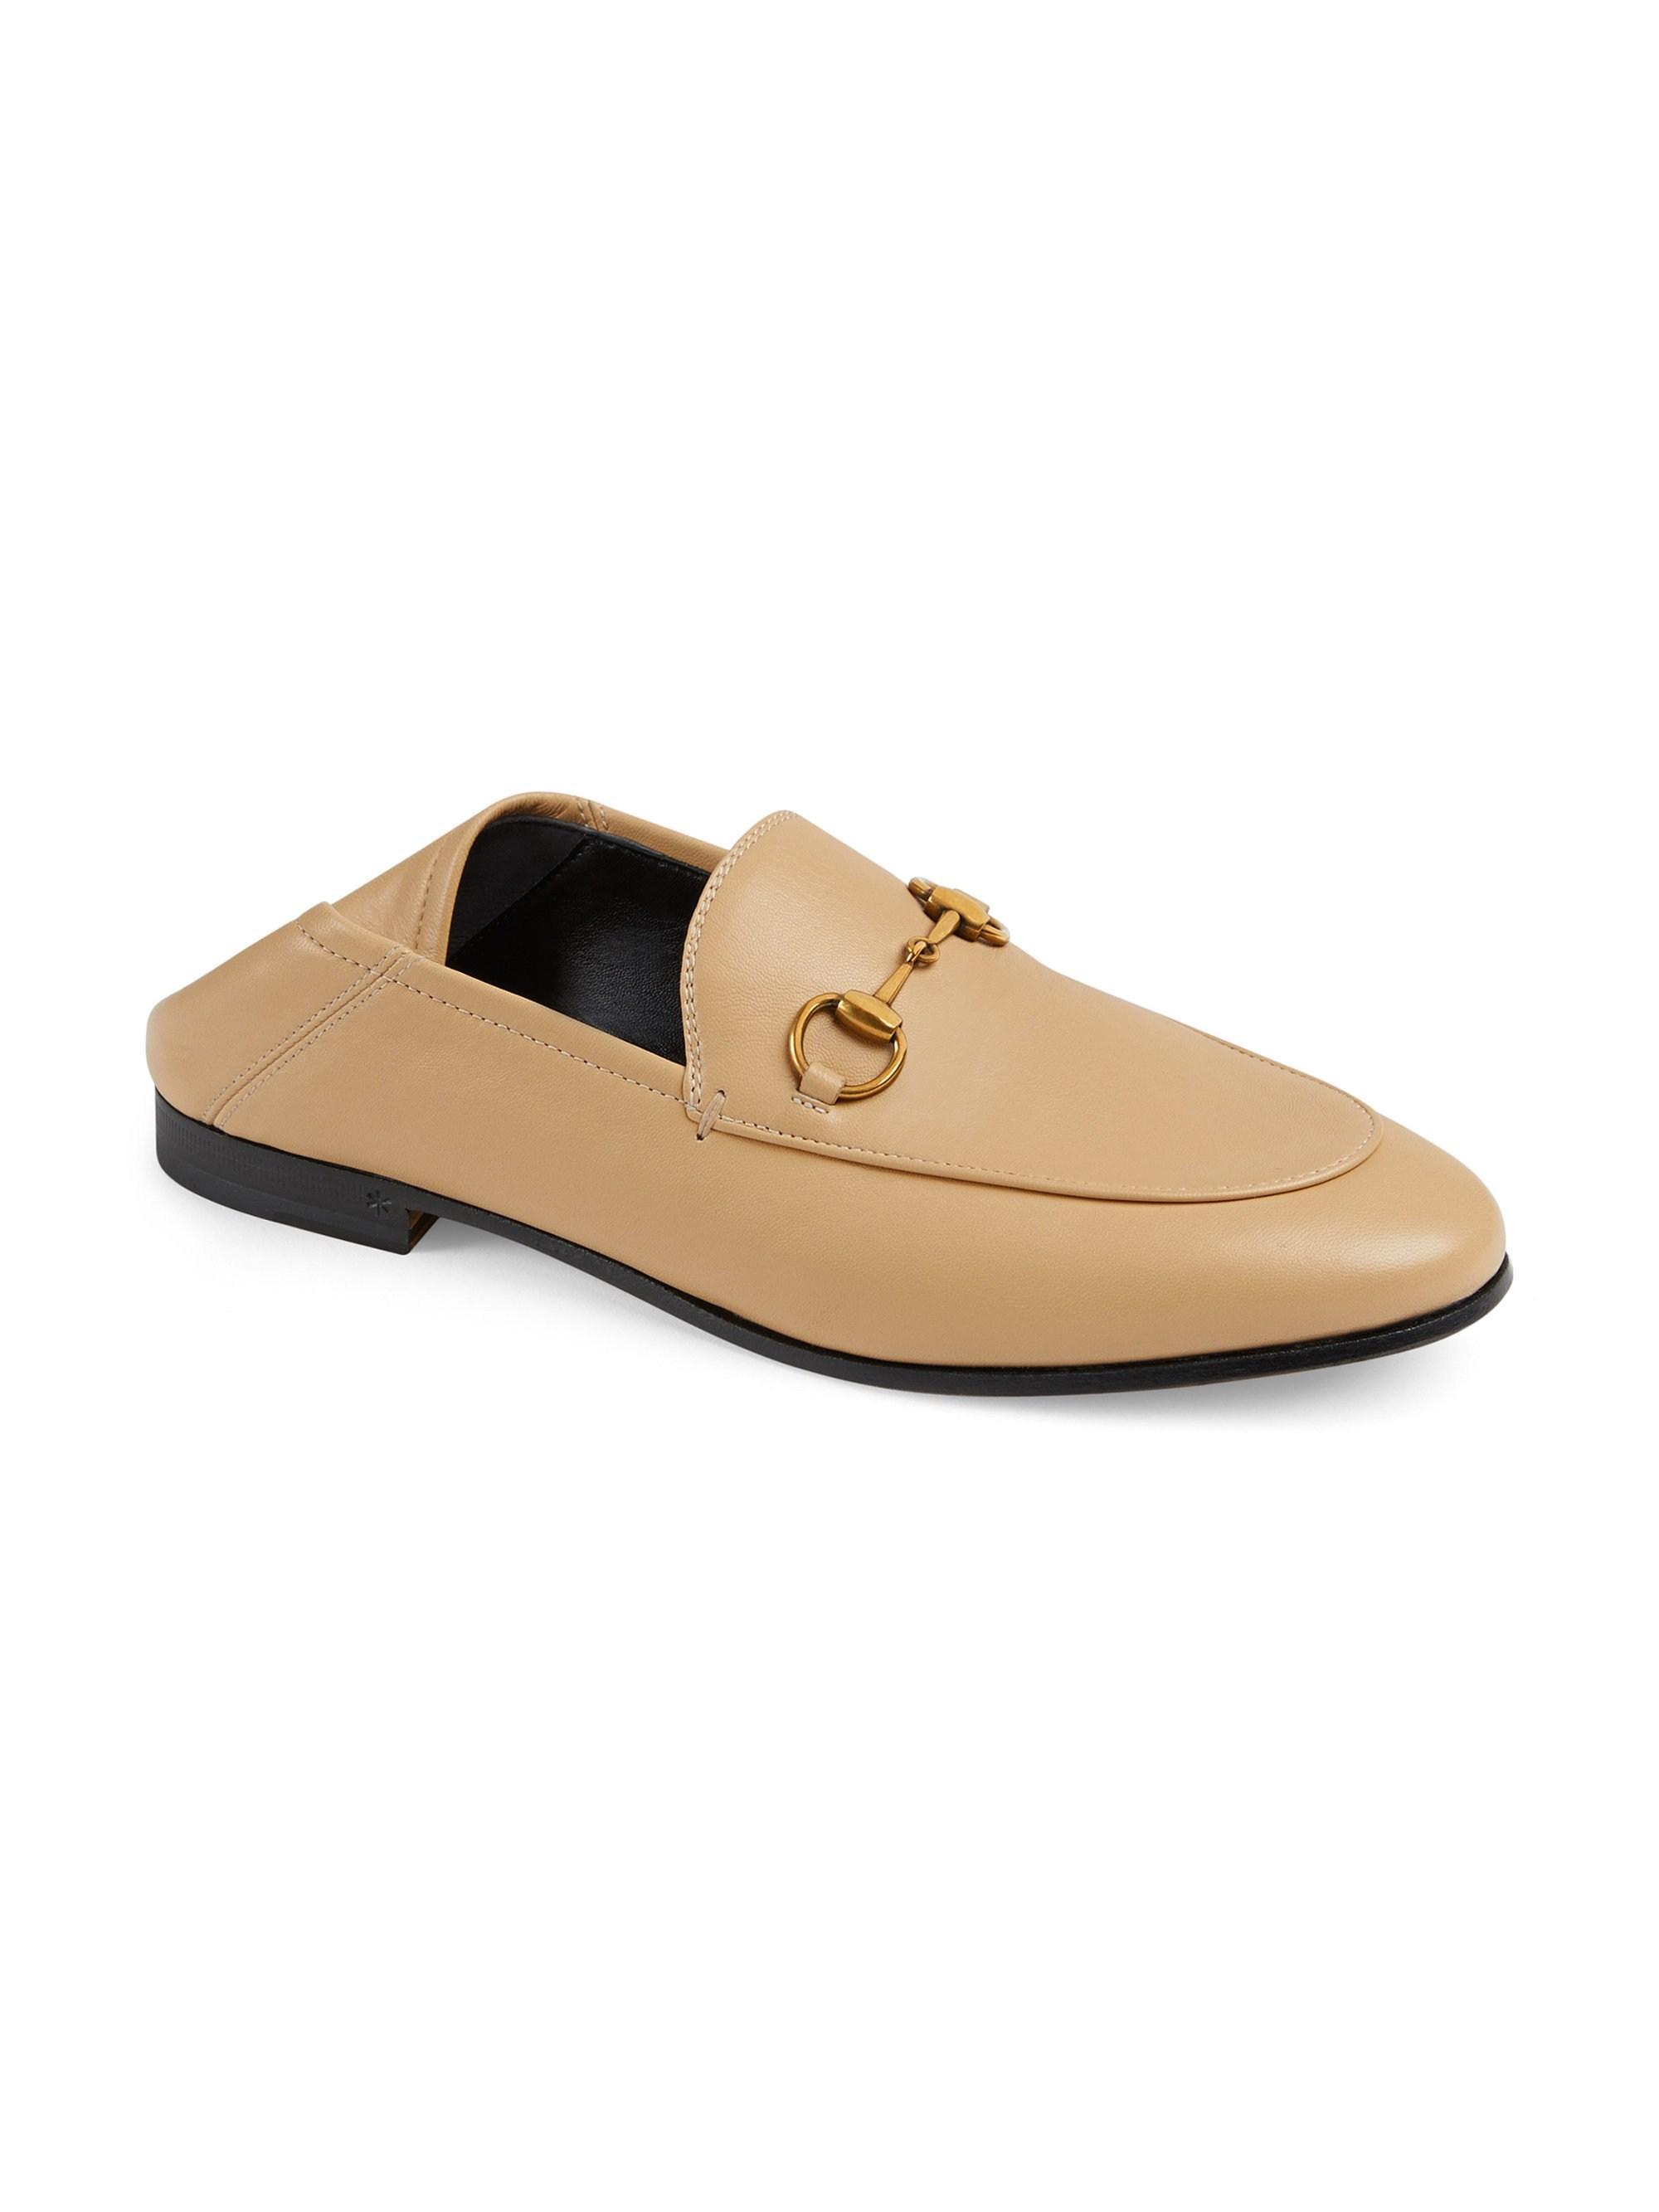 ea8776d00bc Lyst - Gucci Women s Brixton Leather Horsebit Loafers - White